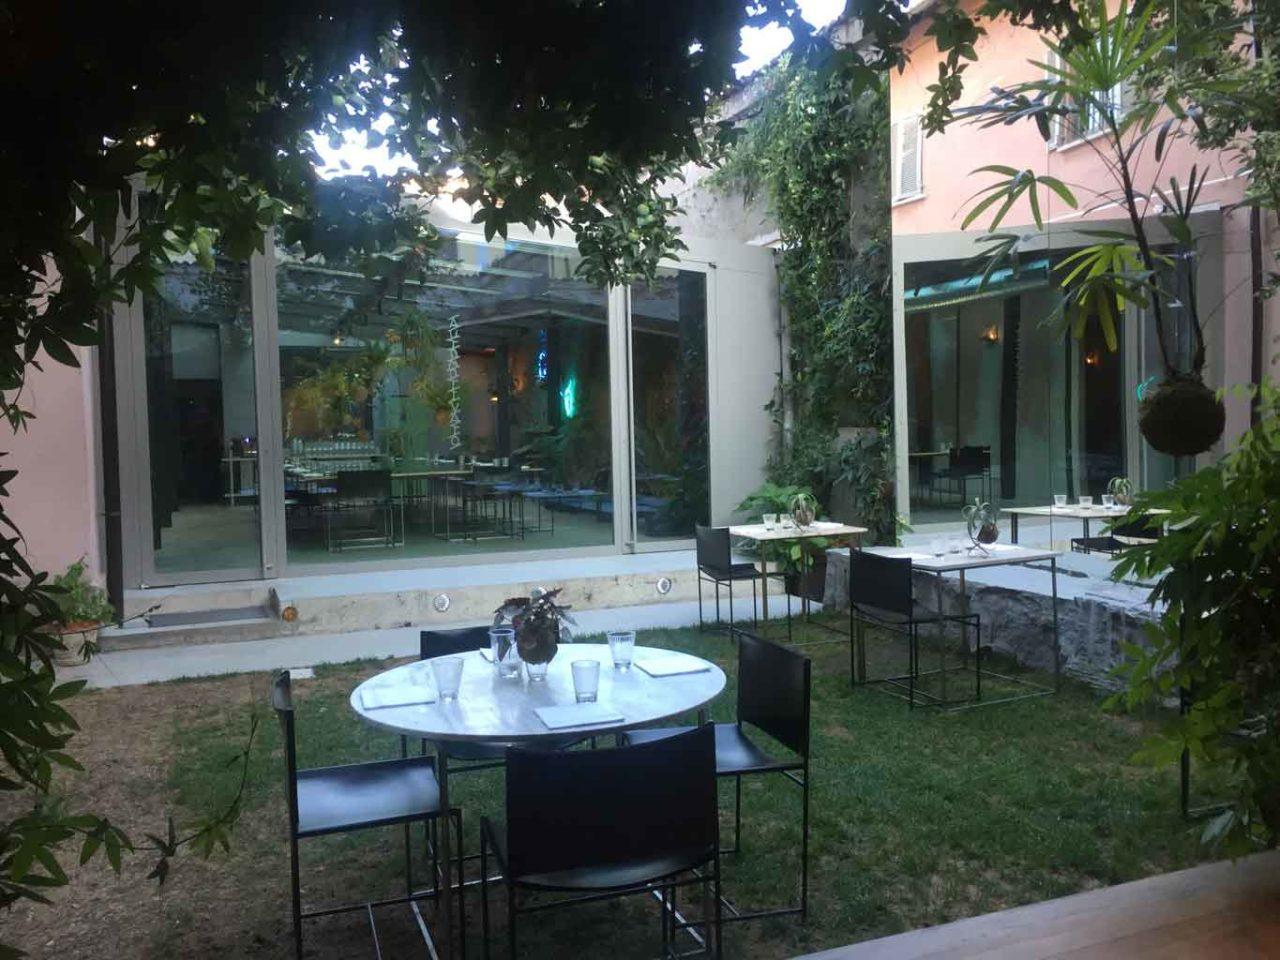 motelombroso tavoli giardino ristoranti all'aperto